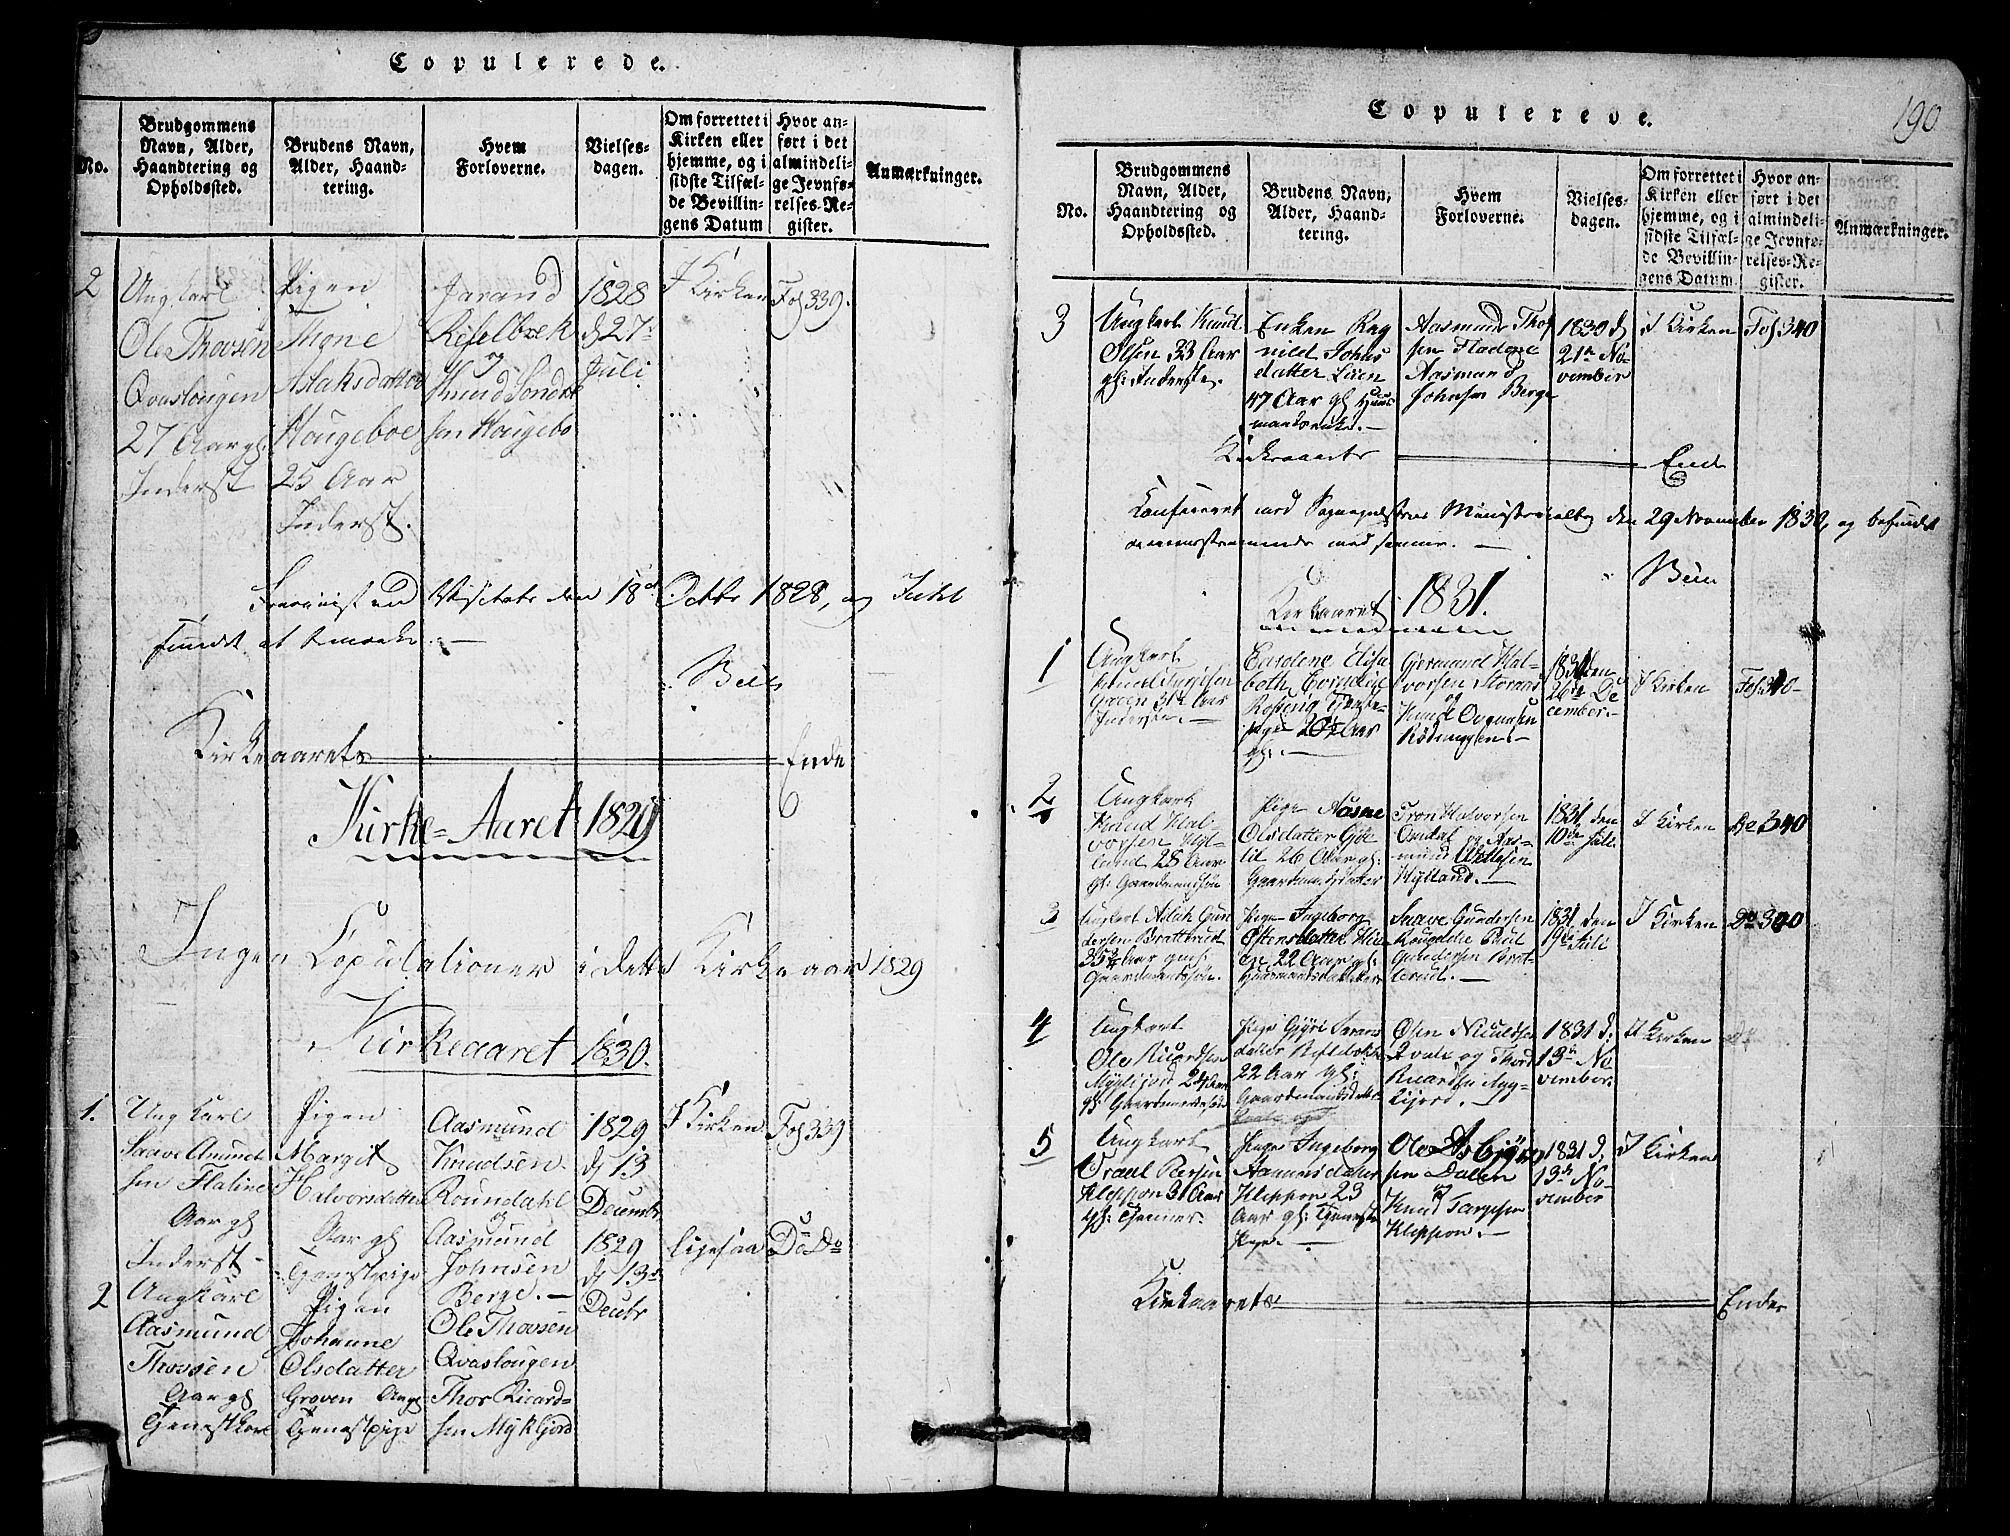 SAKO, Lårdal kirkebøker, G/Gb/L0001: Klokkerbok nr. II 1, 1815-1865, s. 190